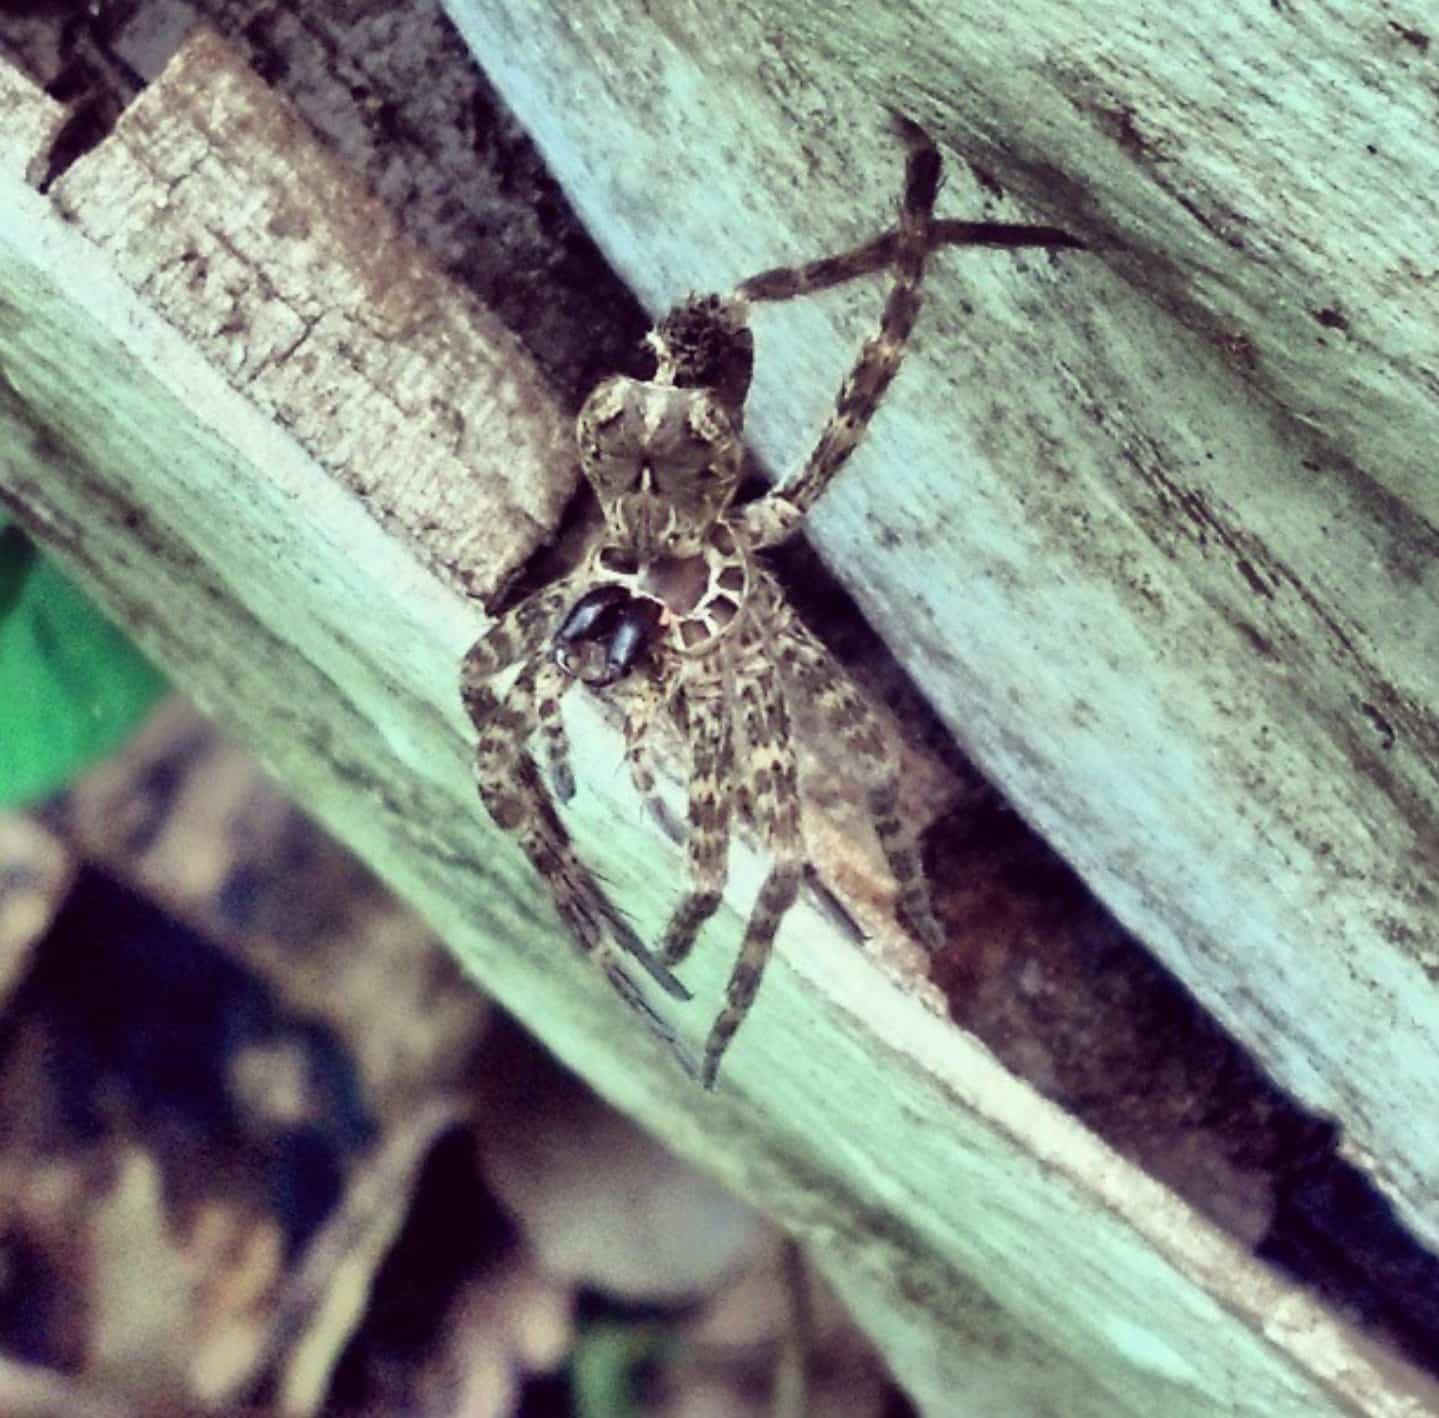 Picture of Dolomedes tenebrosus (Dark Fishing Spider) - Exuviae